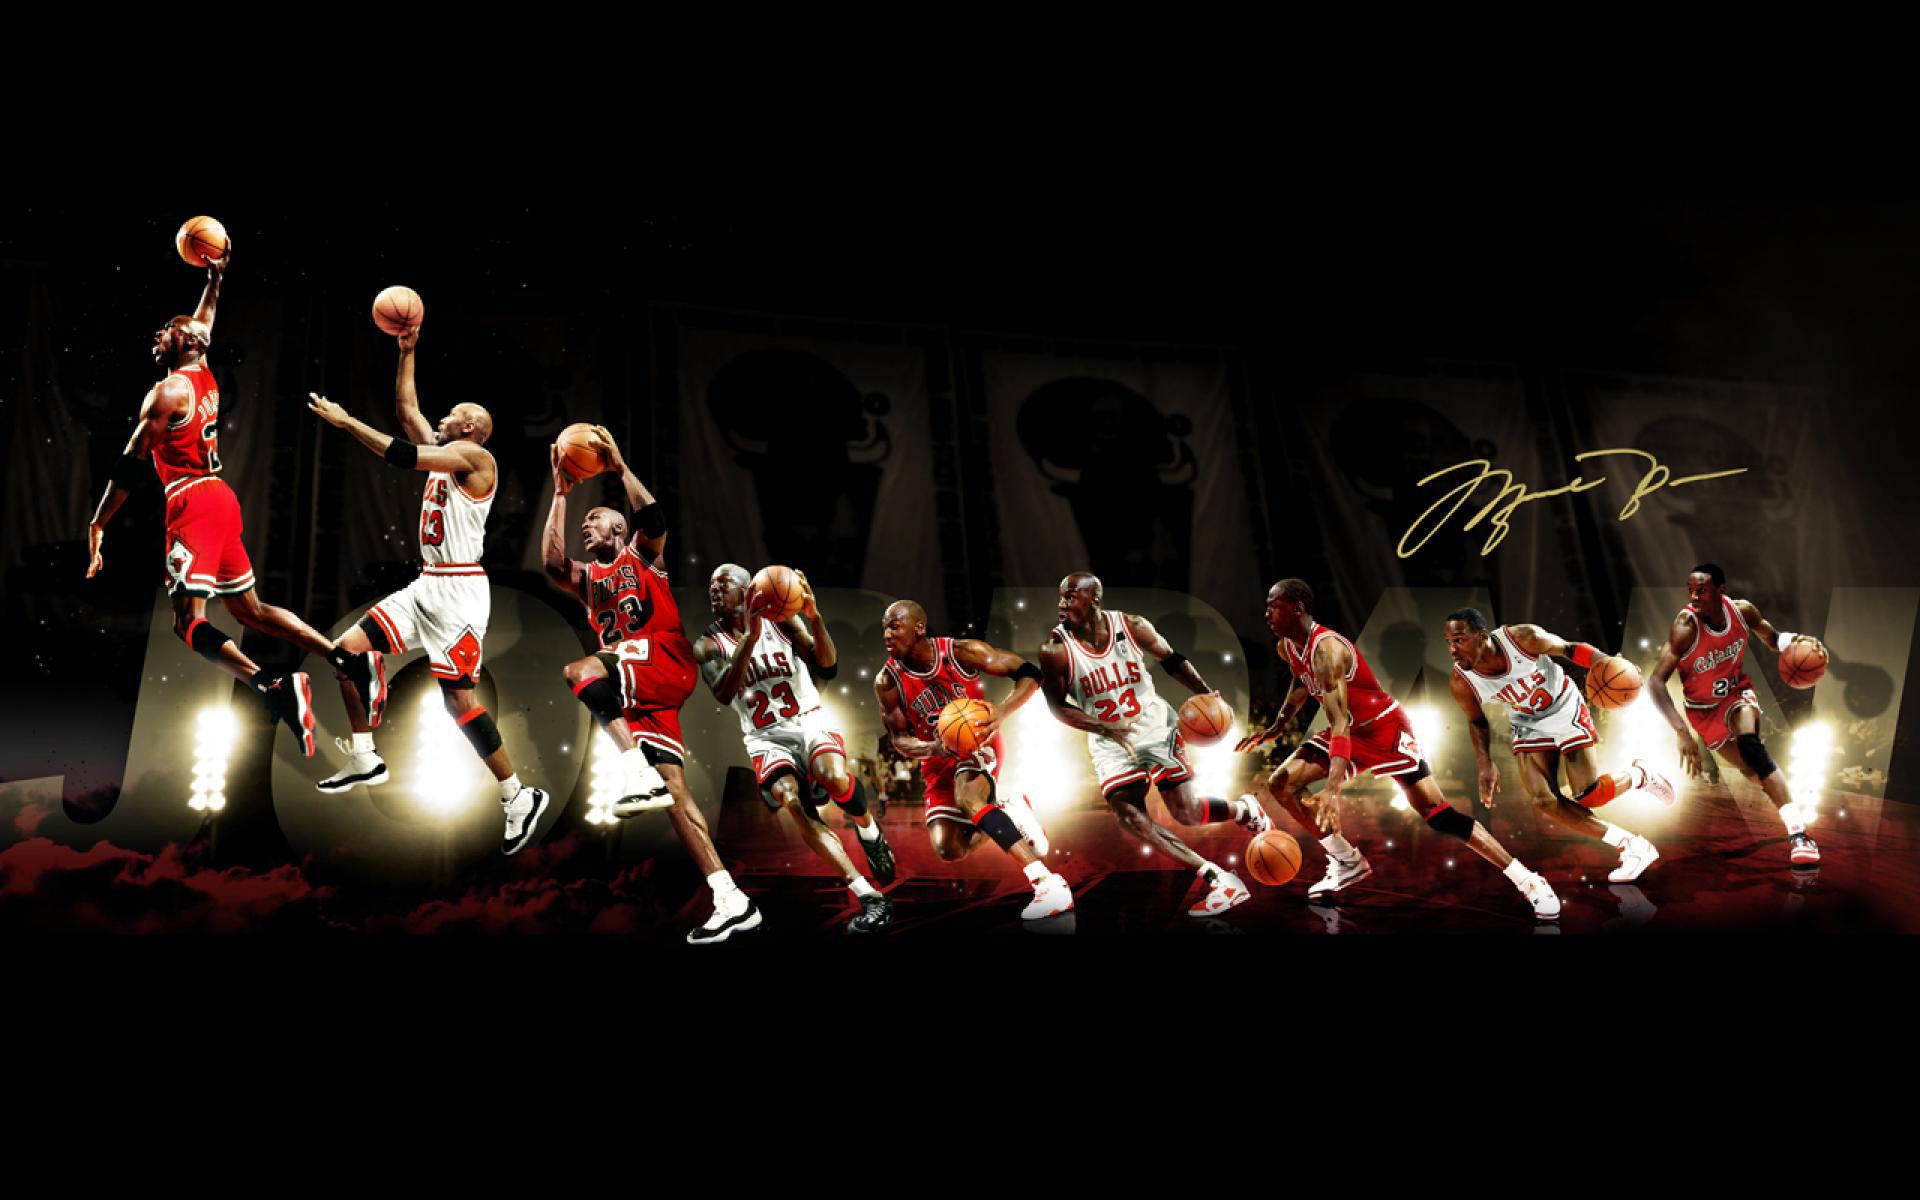 Michael Jordan HD High Quality Wallpaper 852211 1920x1200